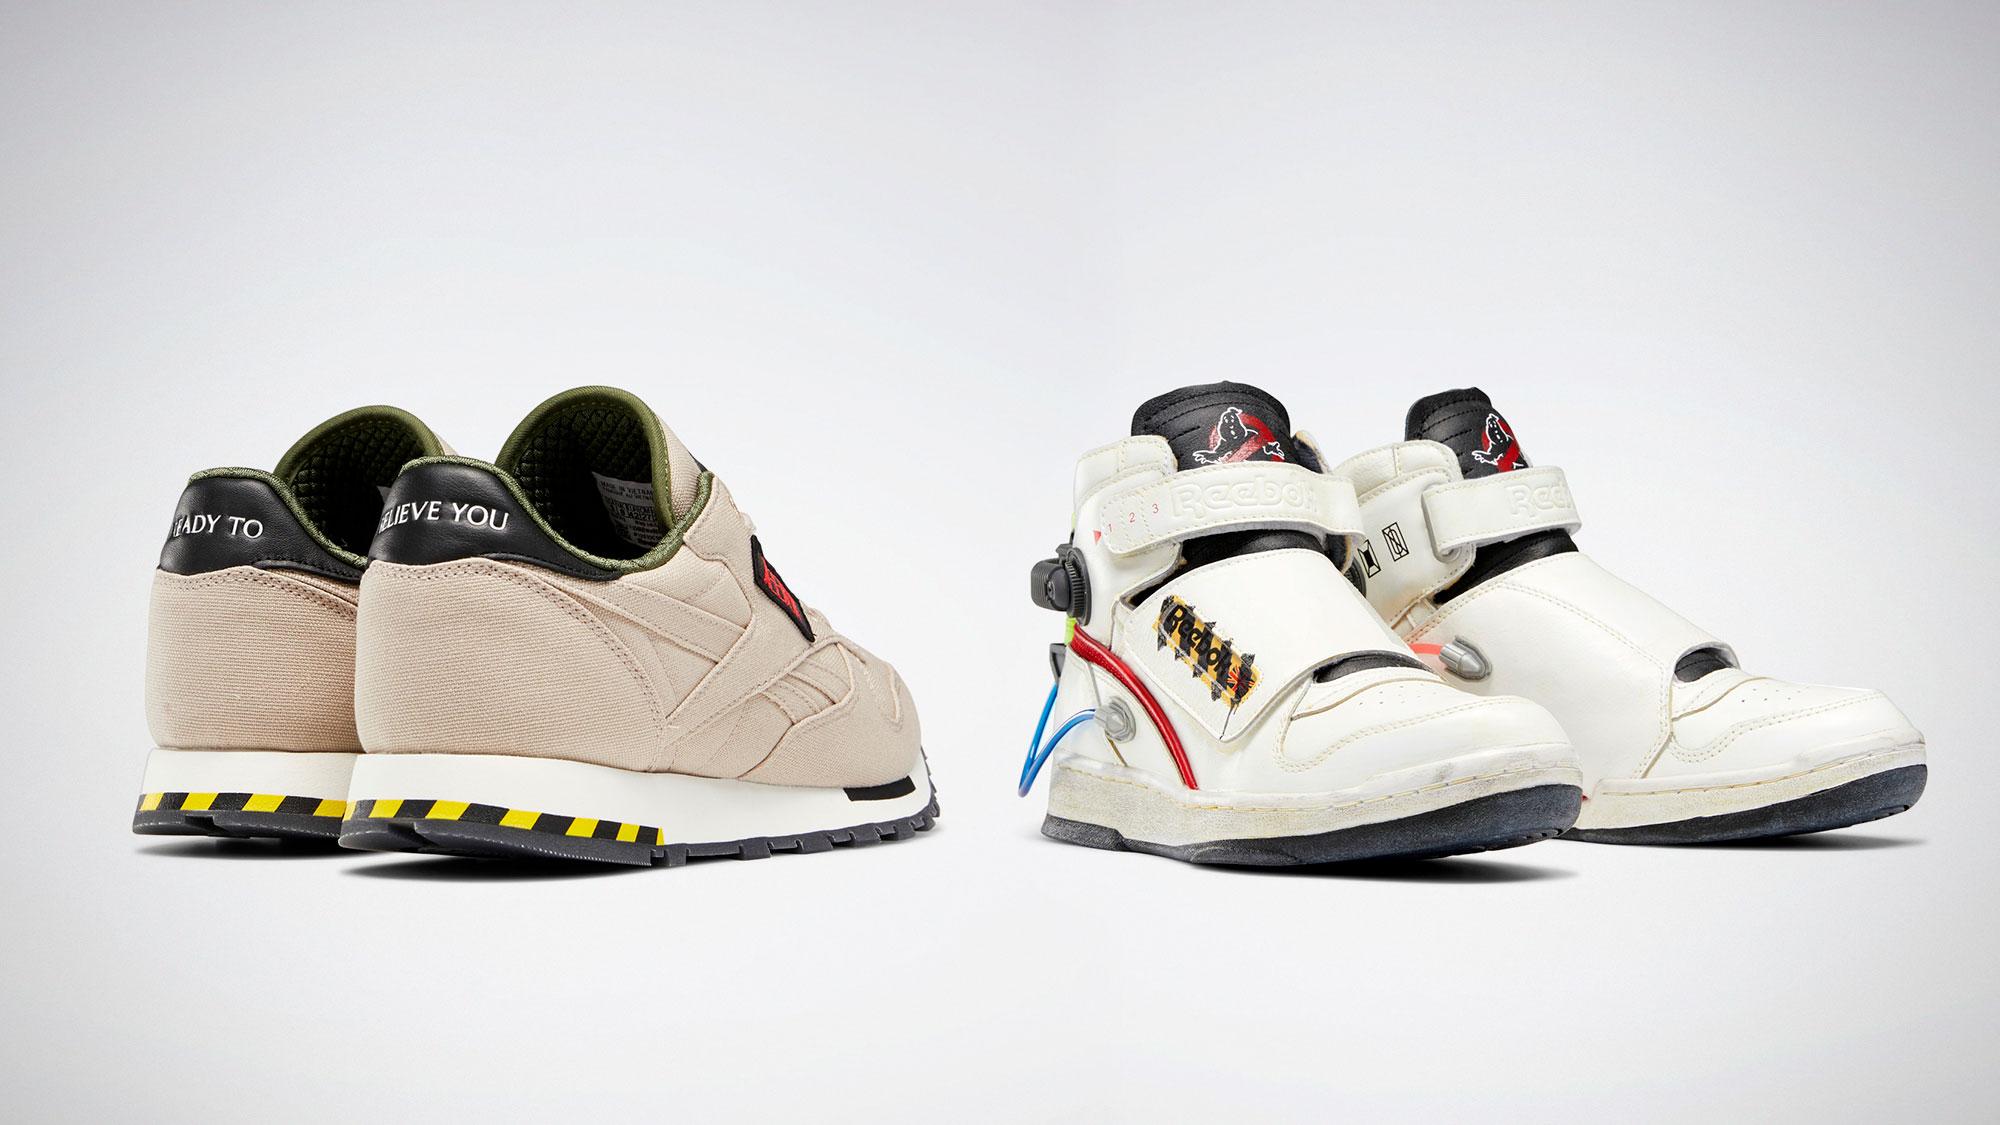 Ghostbusters x Reebok Sneakers